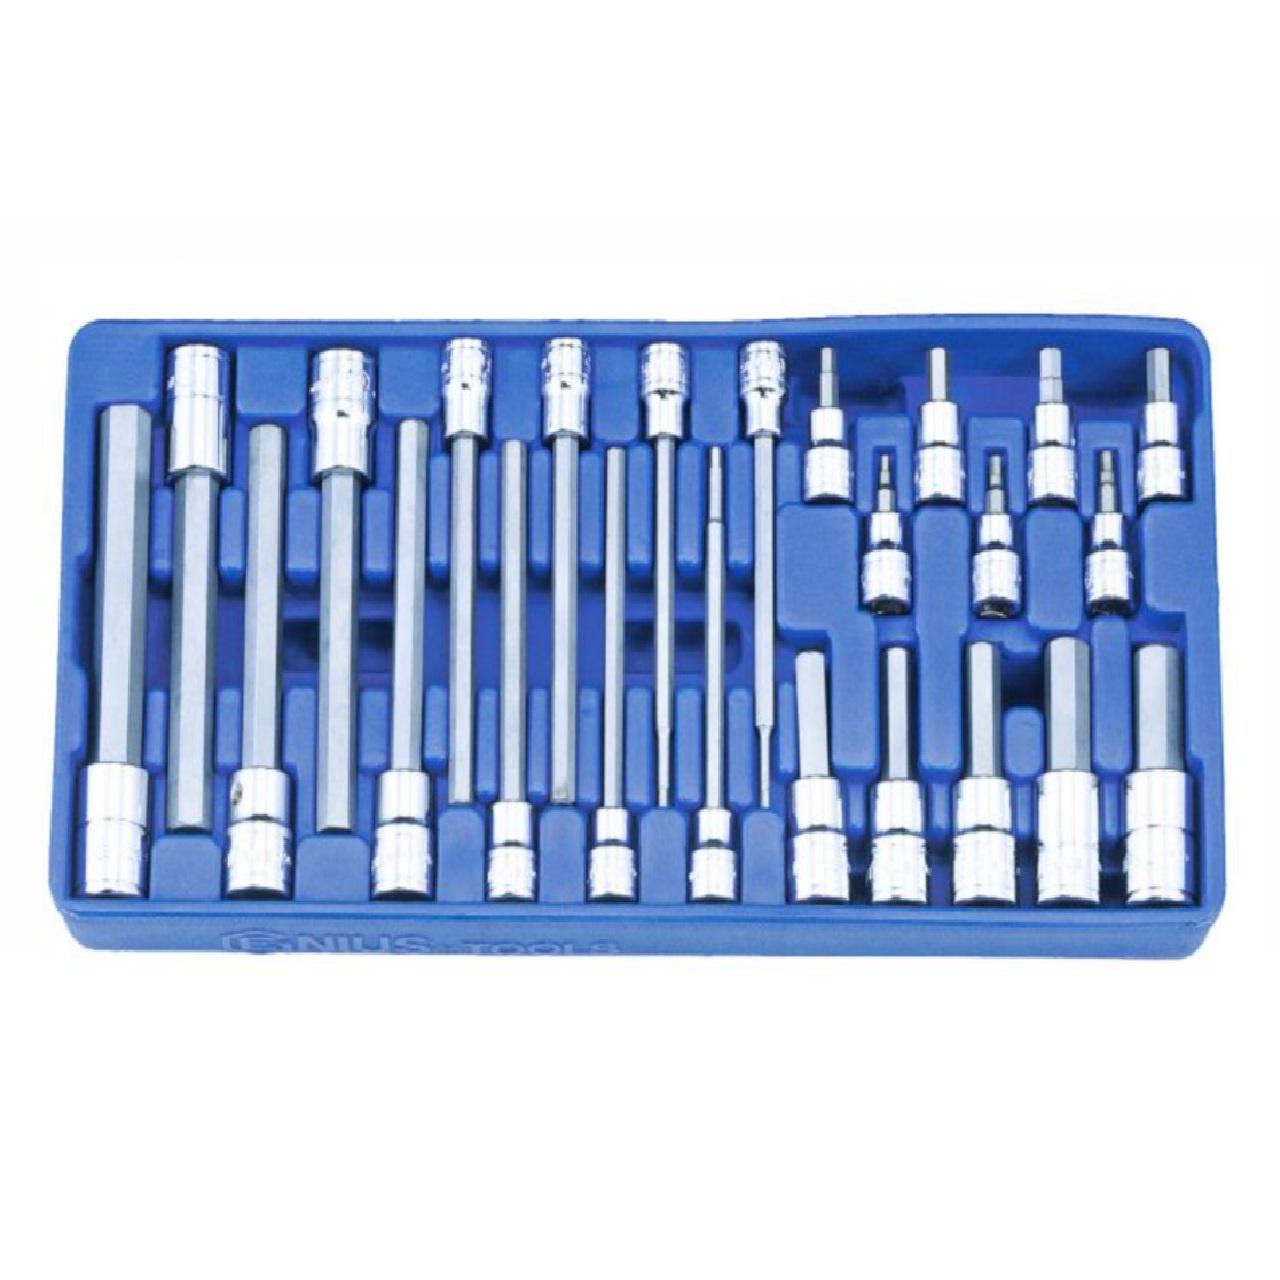 Genius Tools 24PC 3/8 And 1/2 DR SAE Hex Bit Socket Set